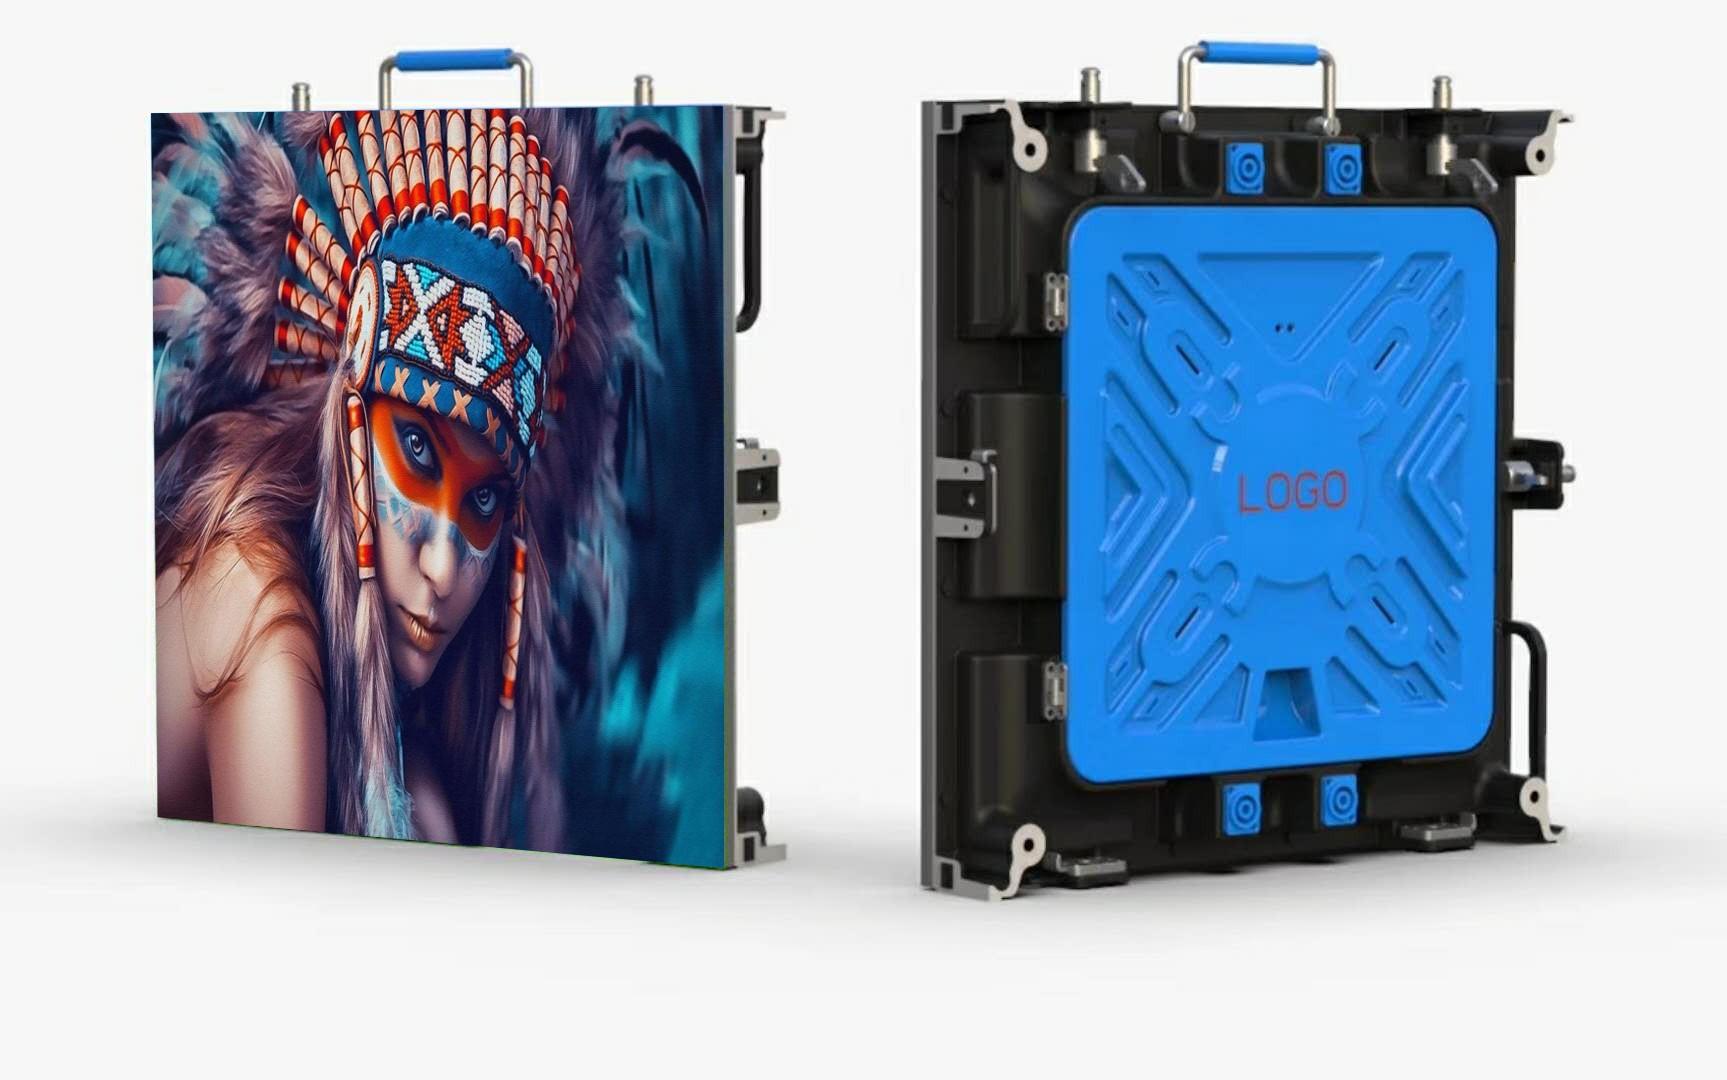 HD LED P1.875 indoor display screen Manufacturers, HD LED P1.875 indoor display screen Factory, Supply HD LED P1.875 indoor display screen